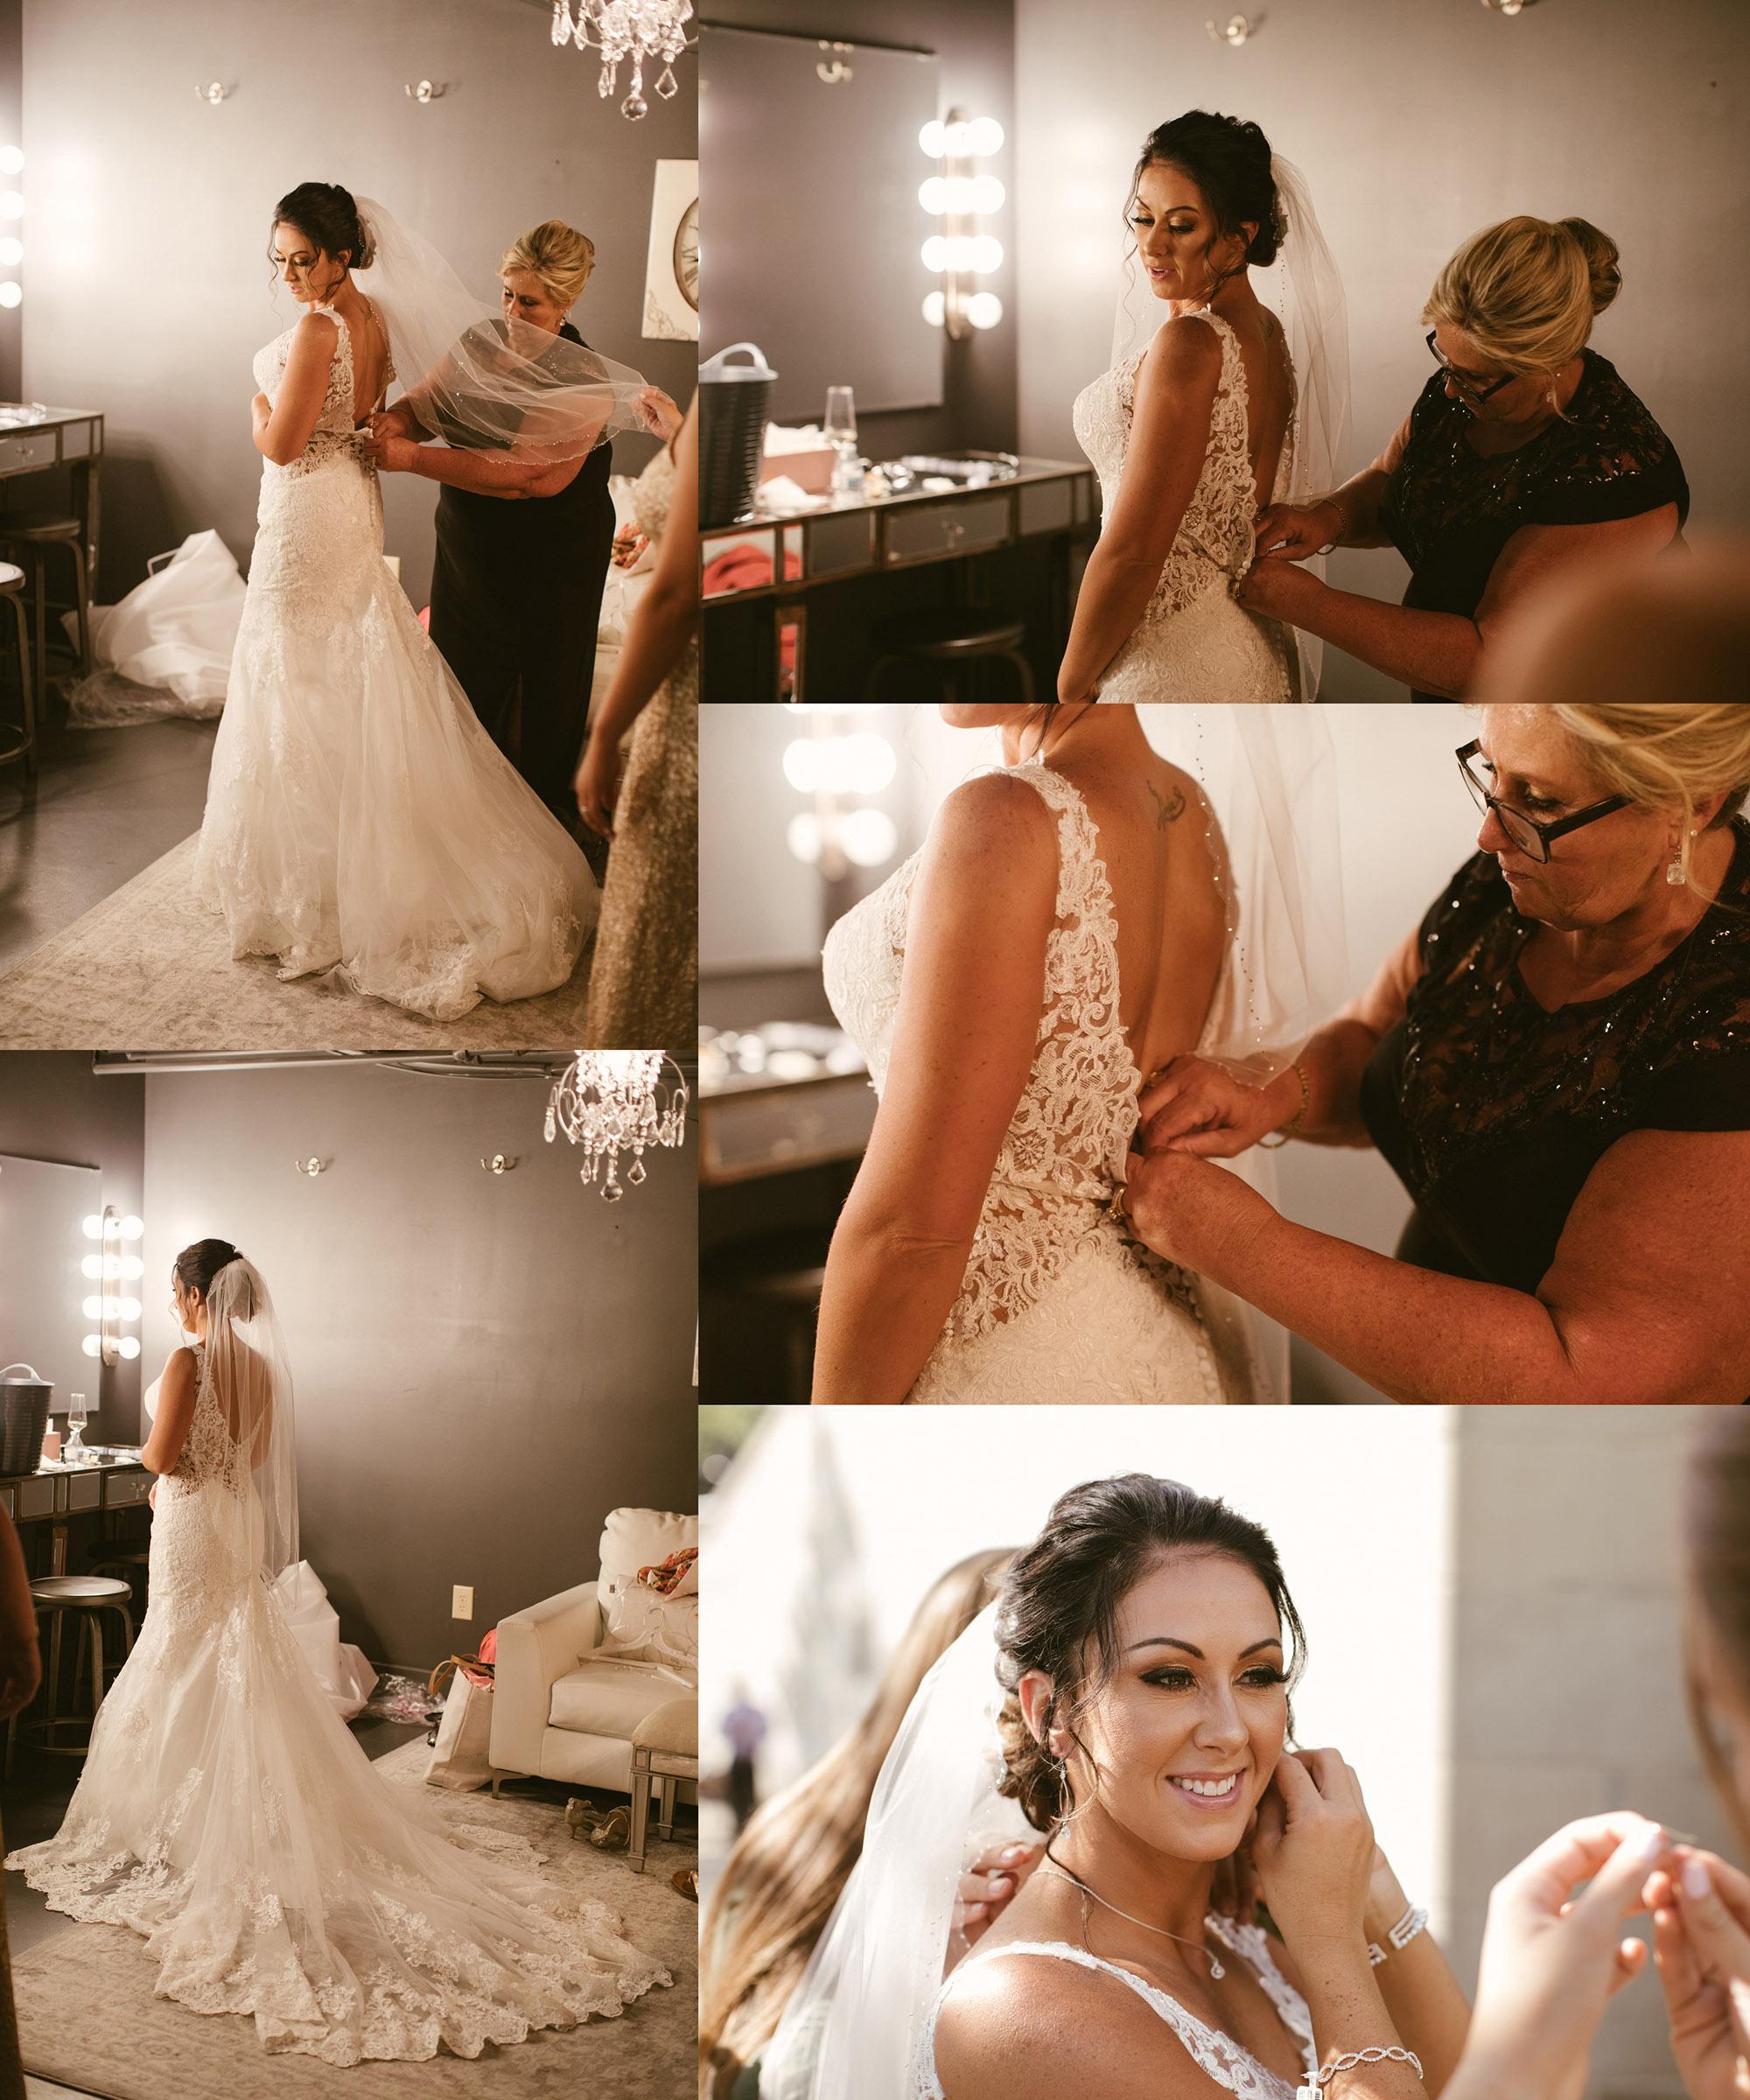 007 aimee ryan wedding canal 337 web.jpg